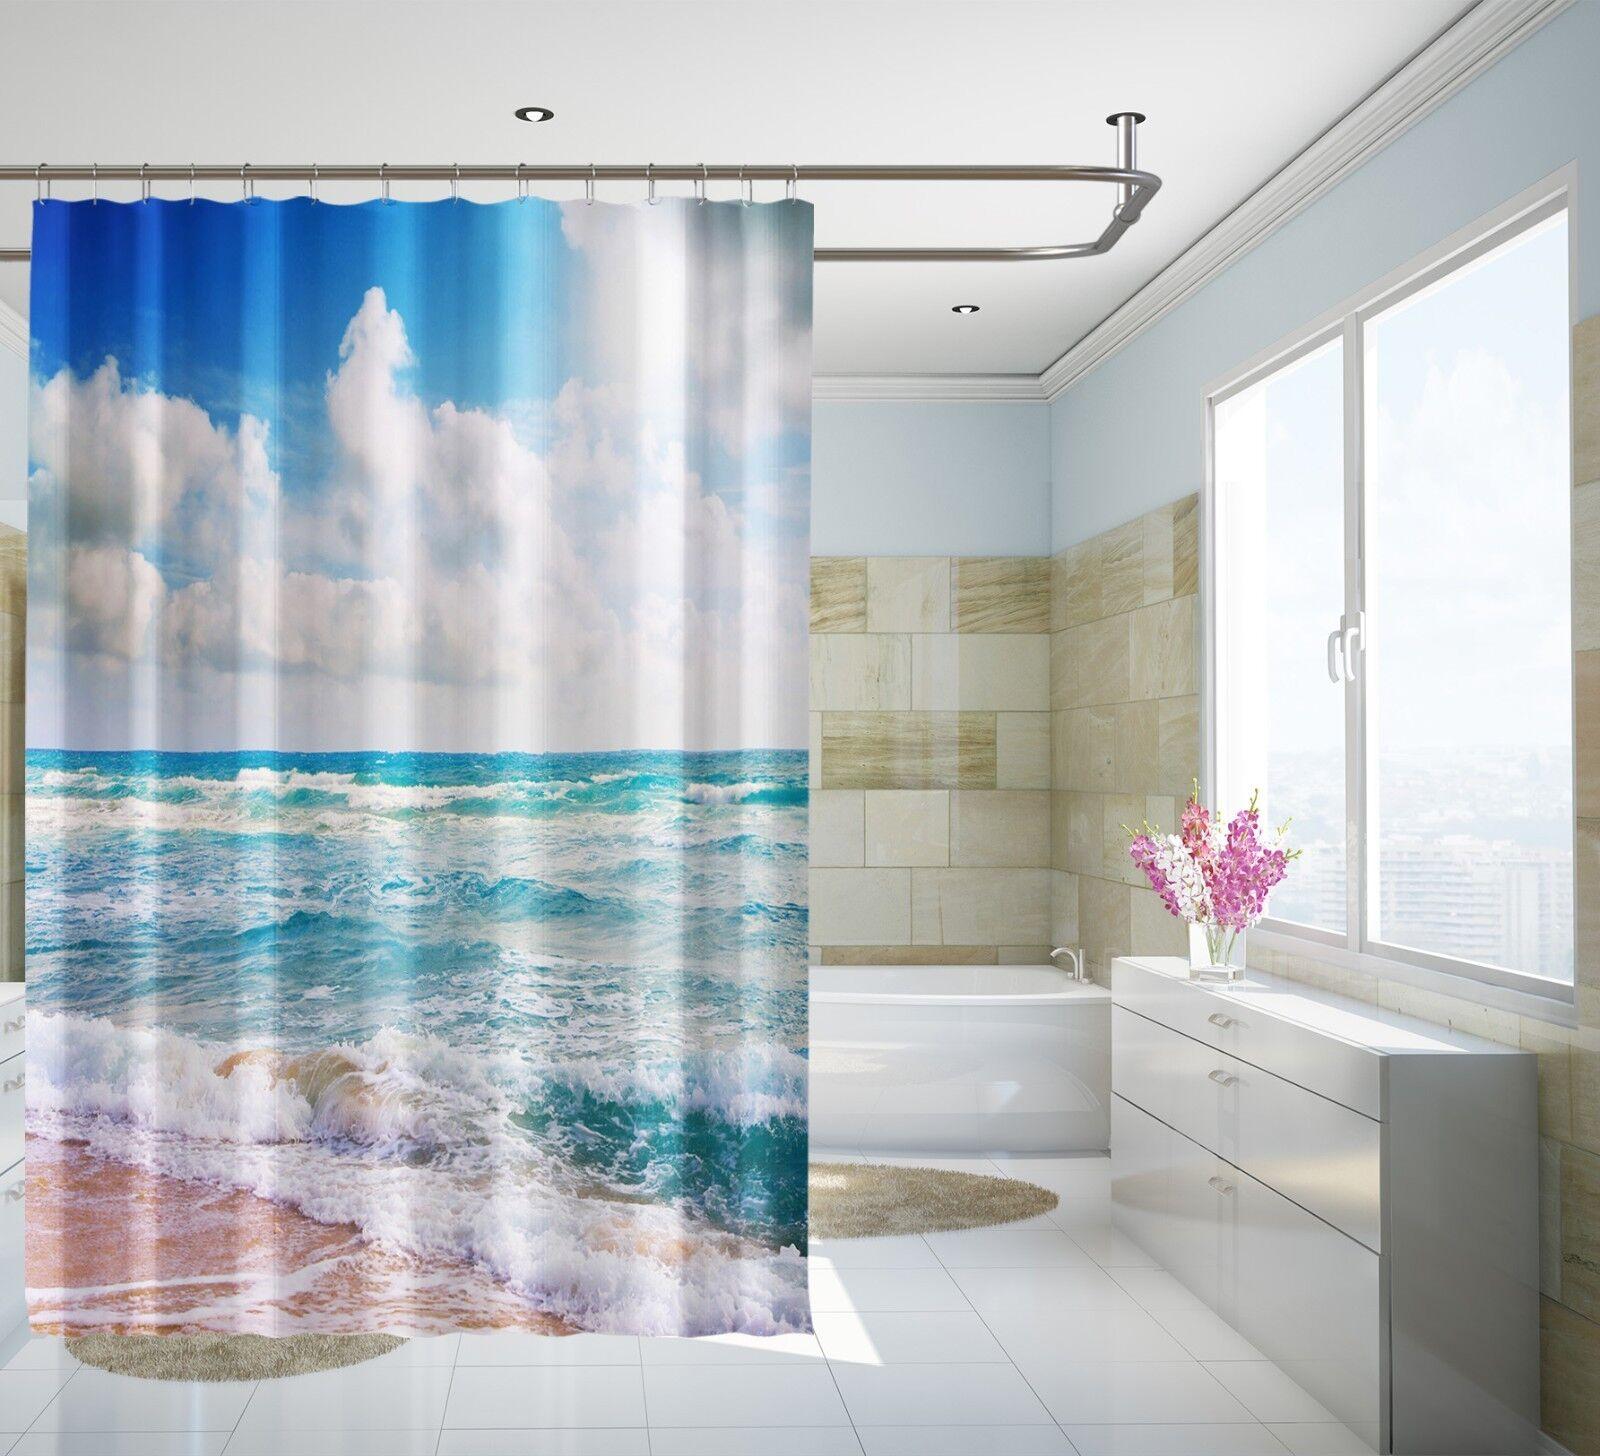 3D CIELO DA SPIAGGIA 1566 Tenda da doccia IMPERMEABILE Fibra Bagno WC CASA FINESTRE